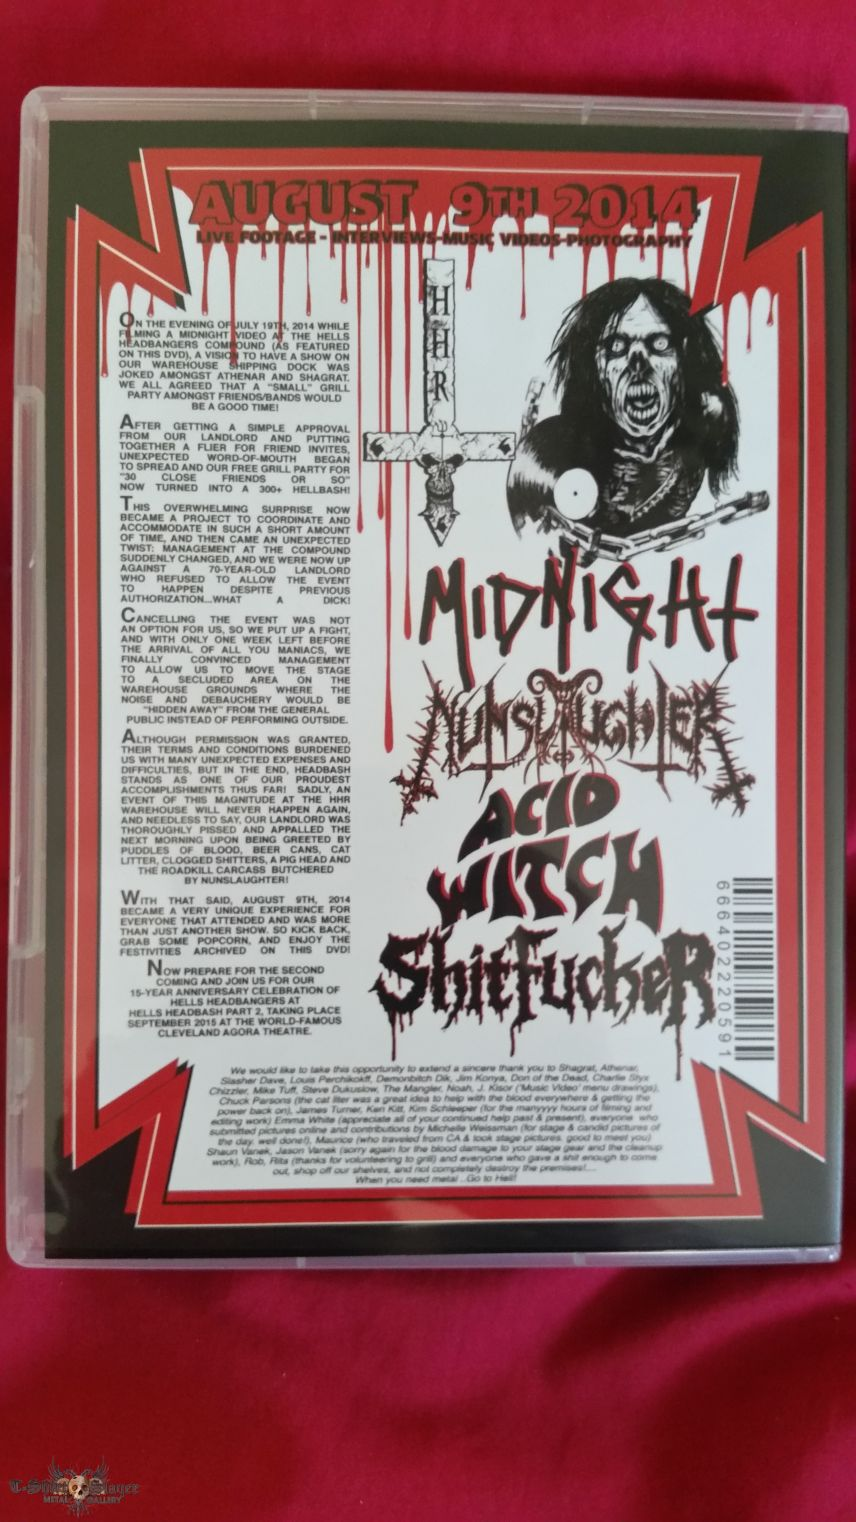 Hells Headbash concert dvd